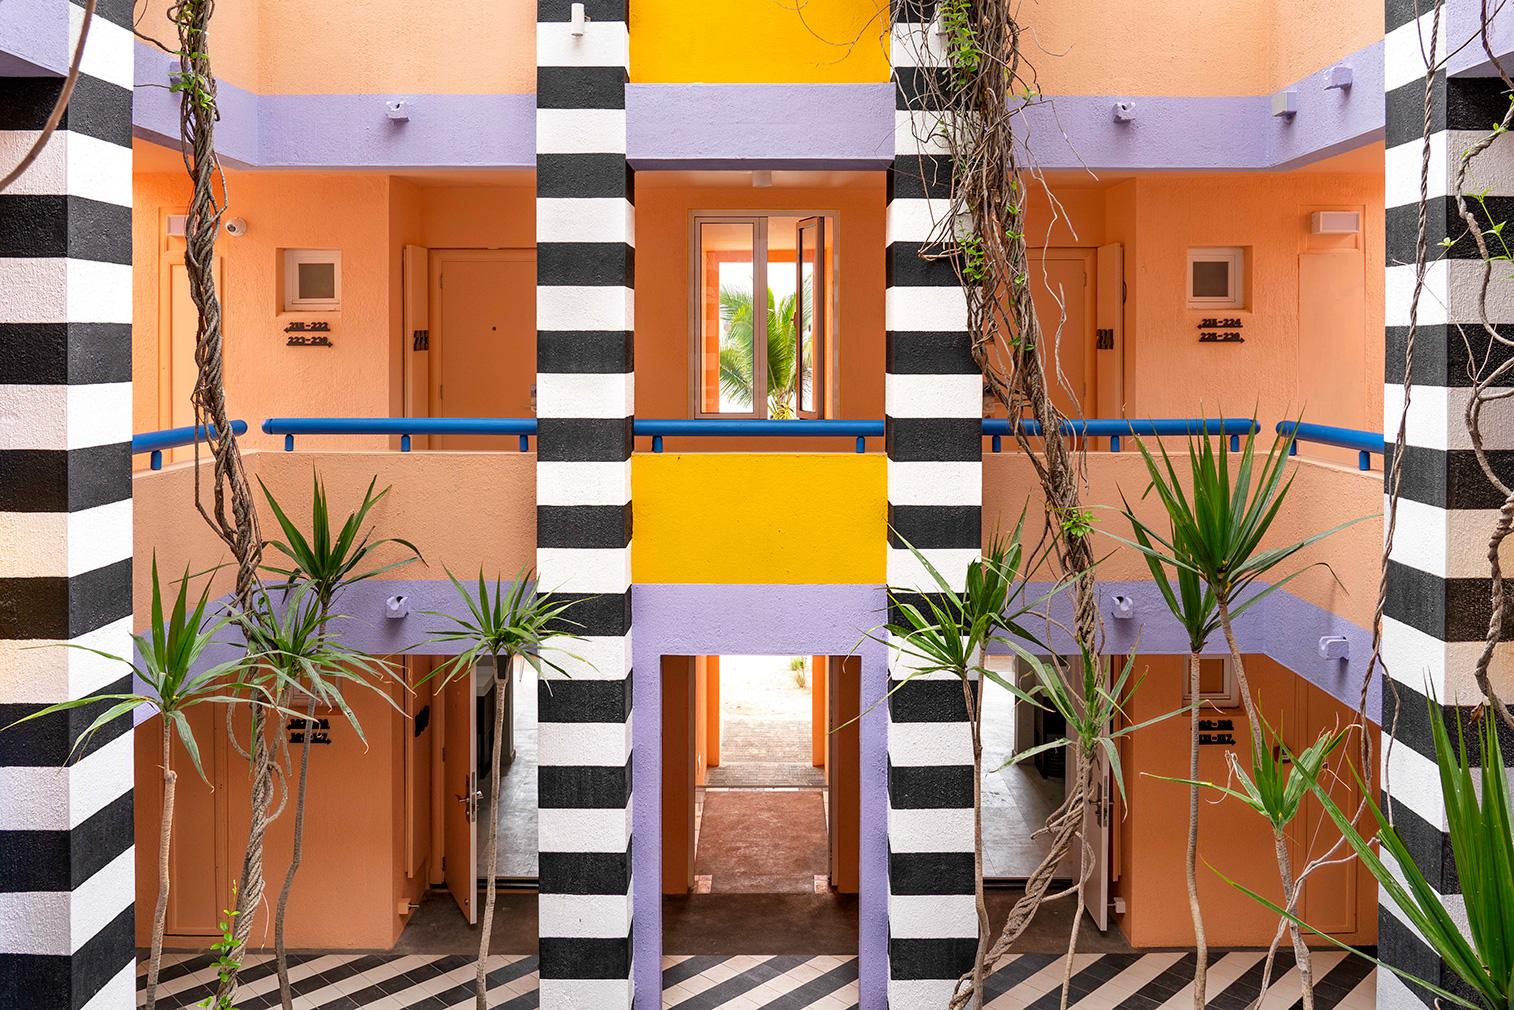 Camille Walala brings kaleidoscopic colour to Mauritius hotel SALT of Palmar